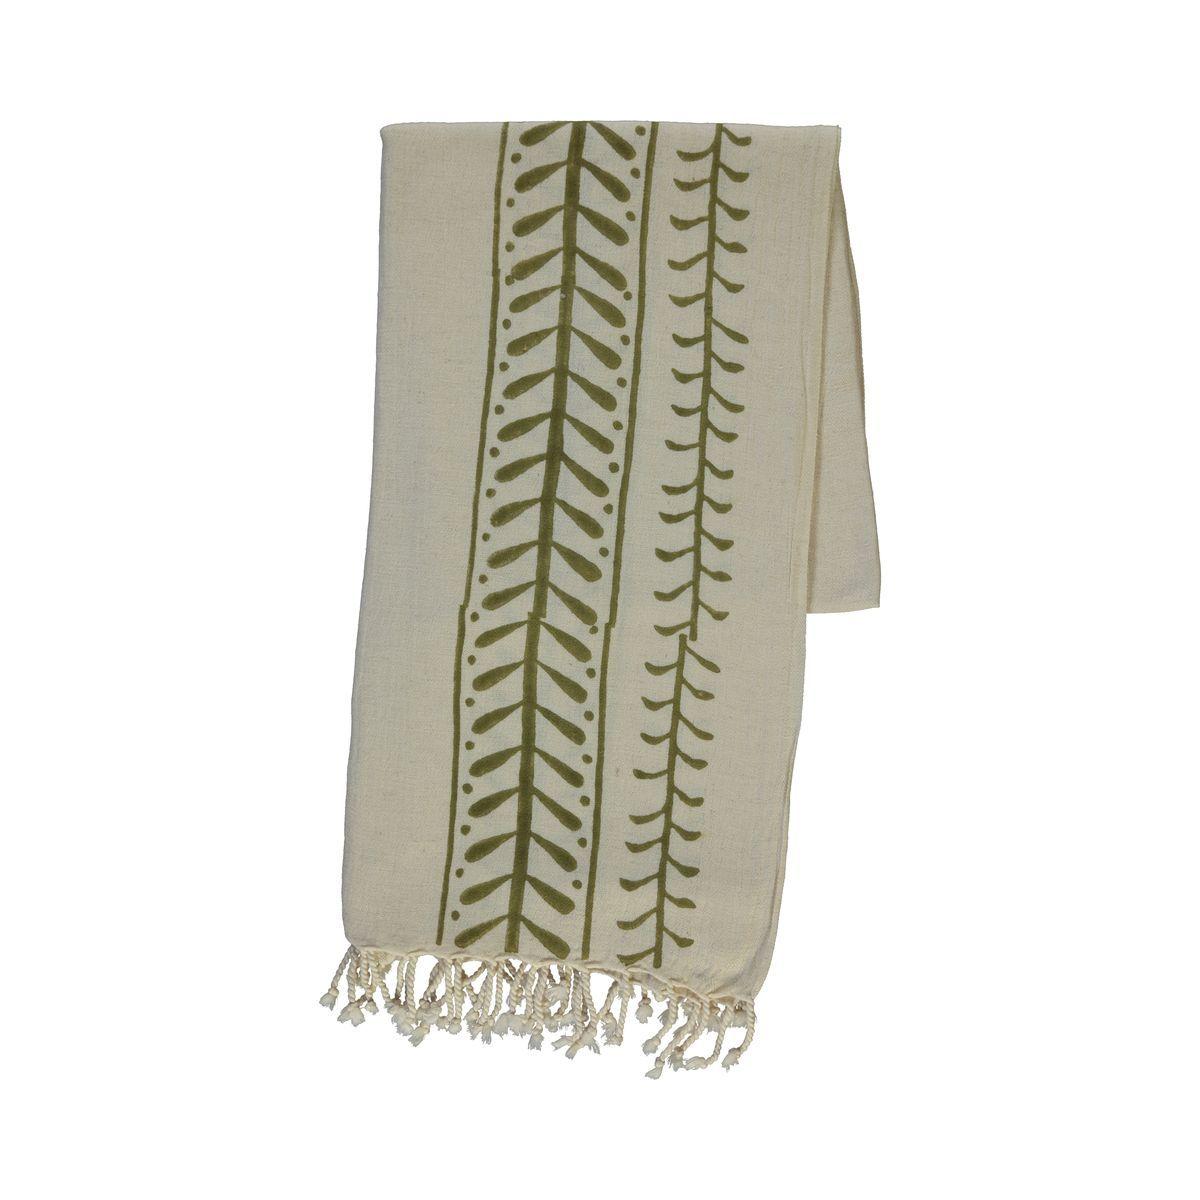 Peshtemal Hand printed 15 - Green